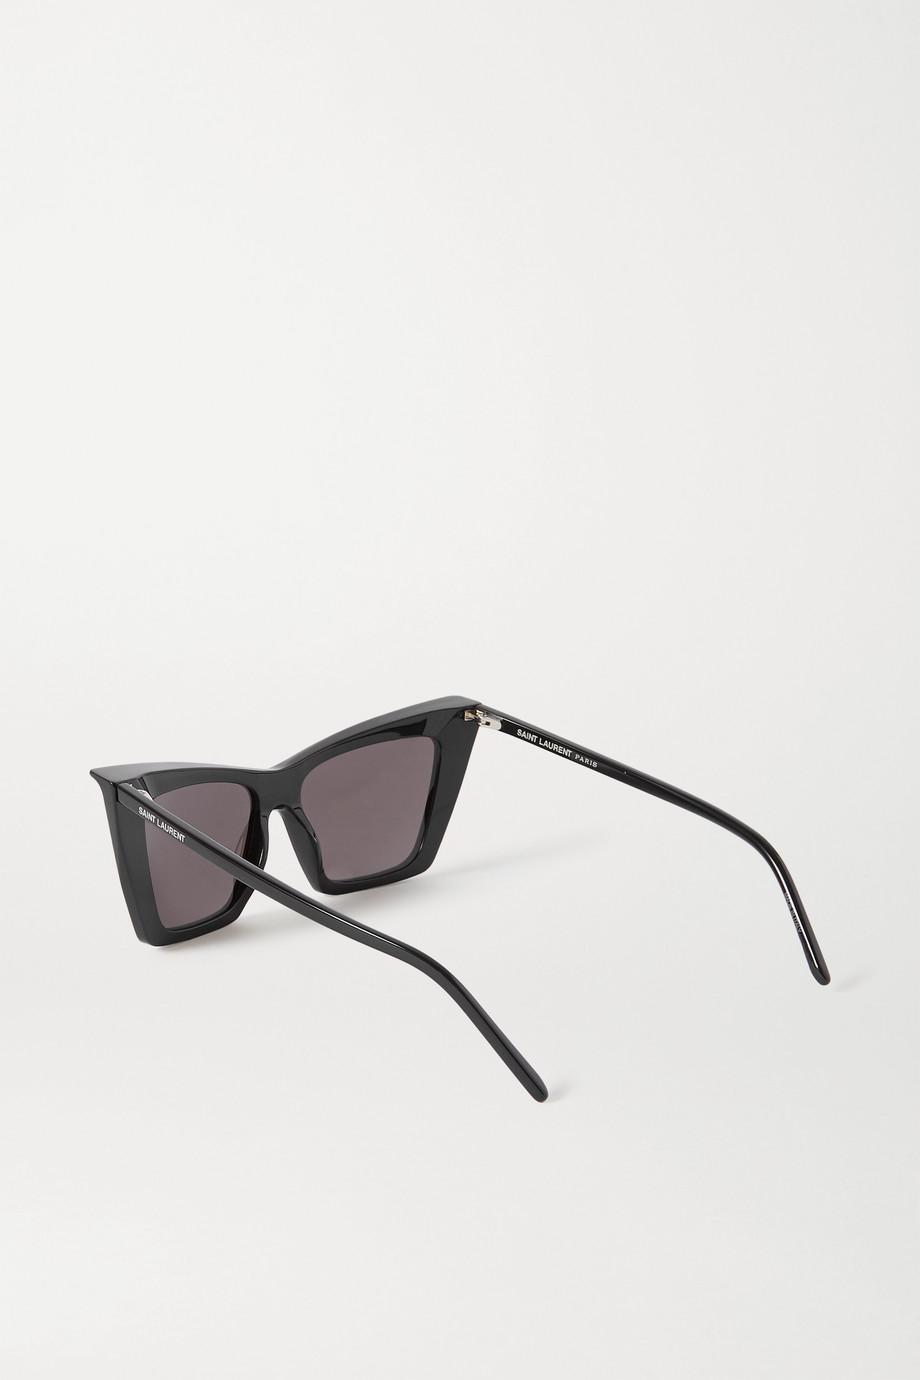 SAINT LAURENT 板材猫眼太阳镜